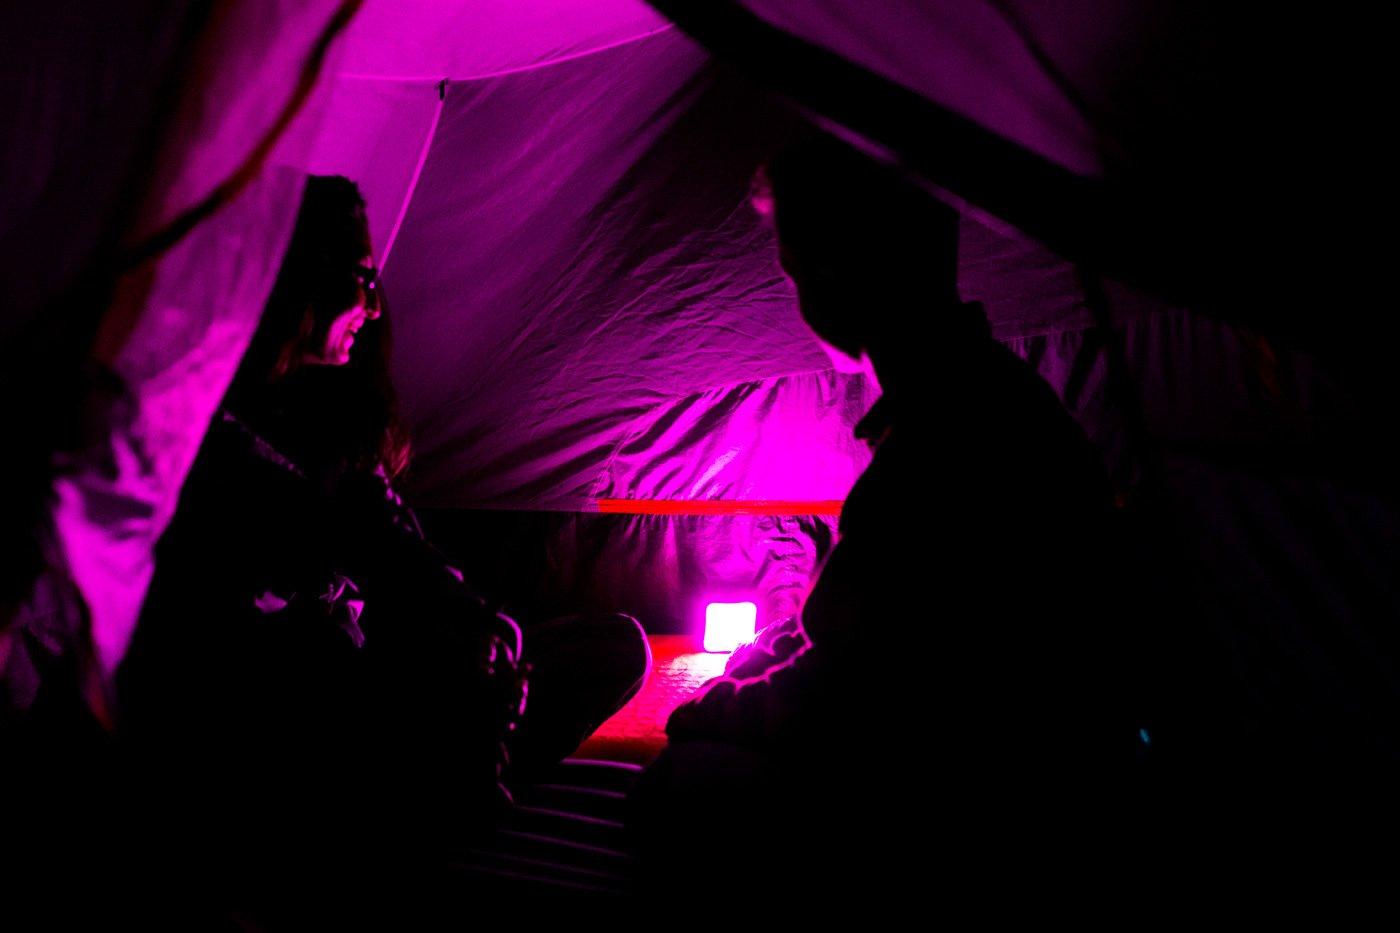 BioLite Sunlight Solar Powered Lantern, Grey by BioLite (Image #8)